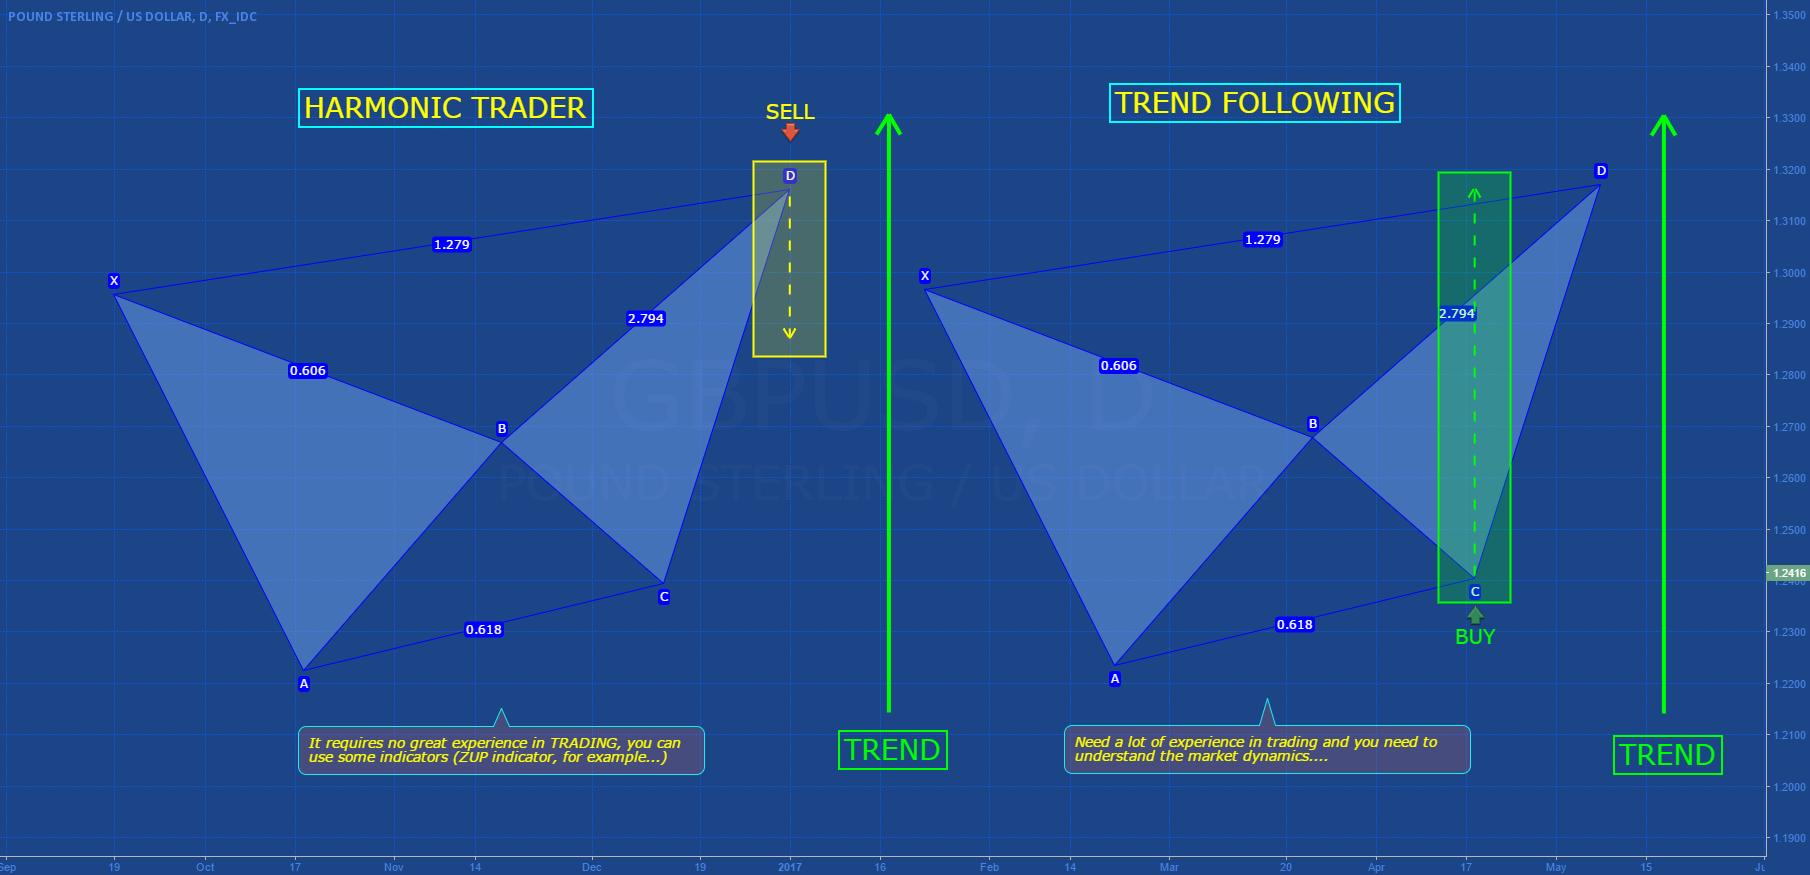 HARMONIC TRADER vs TREND FOLLOWING (Part I)